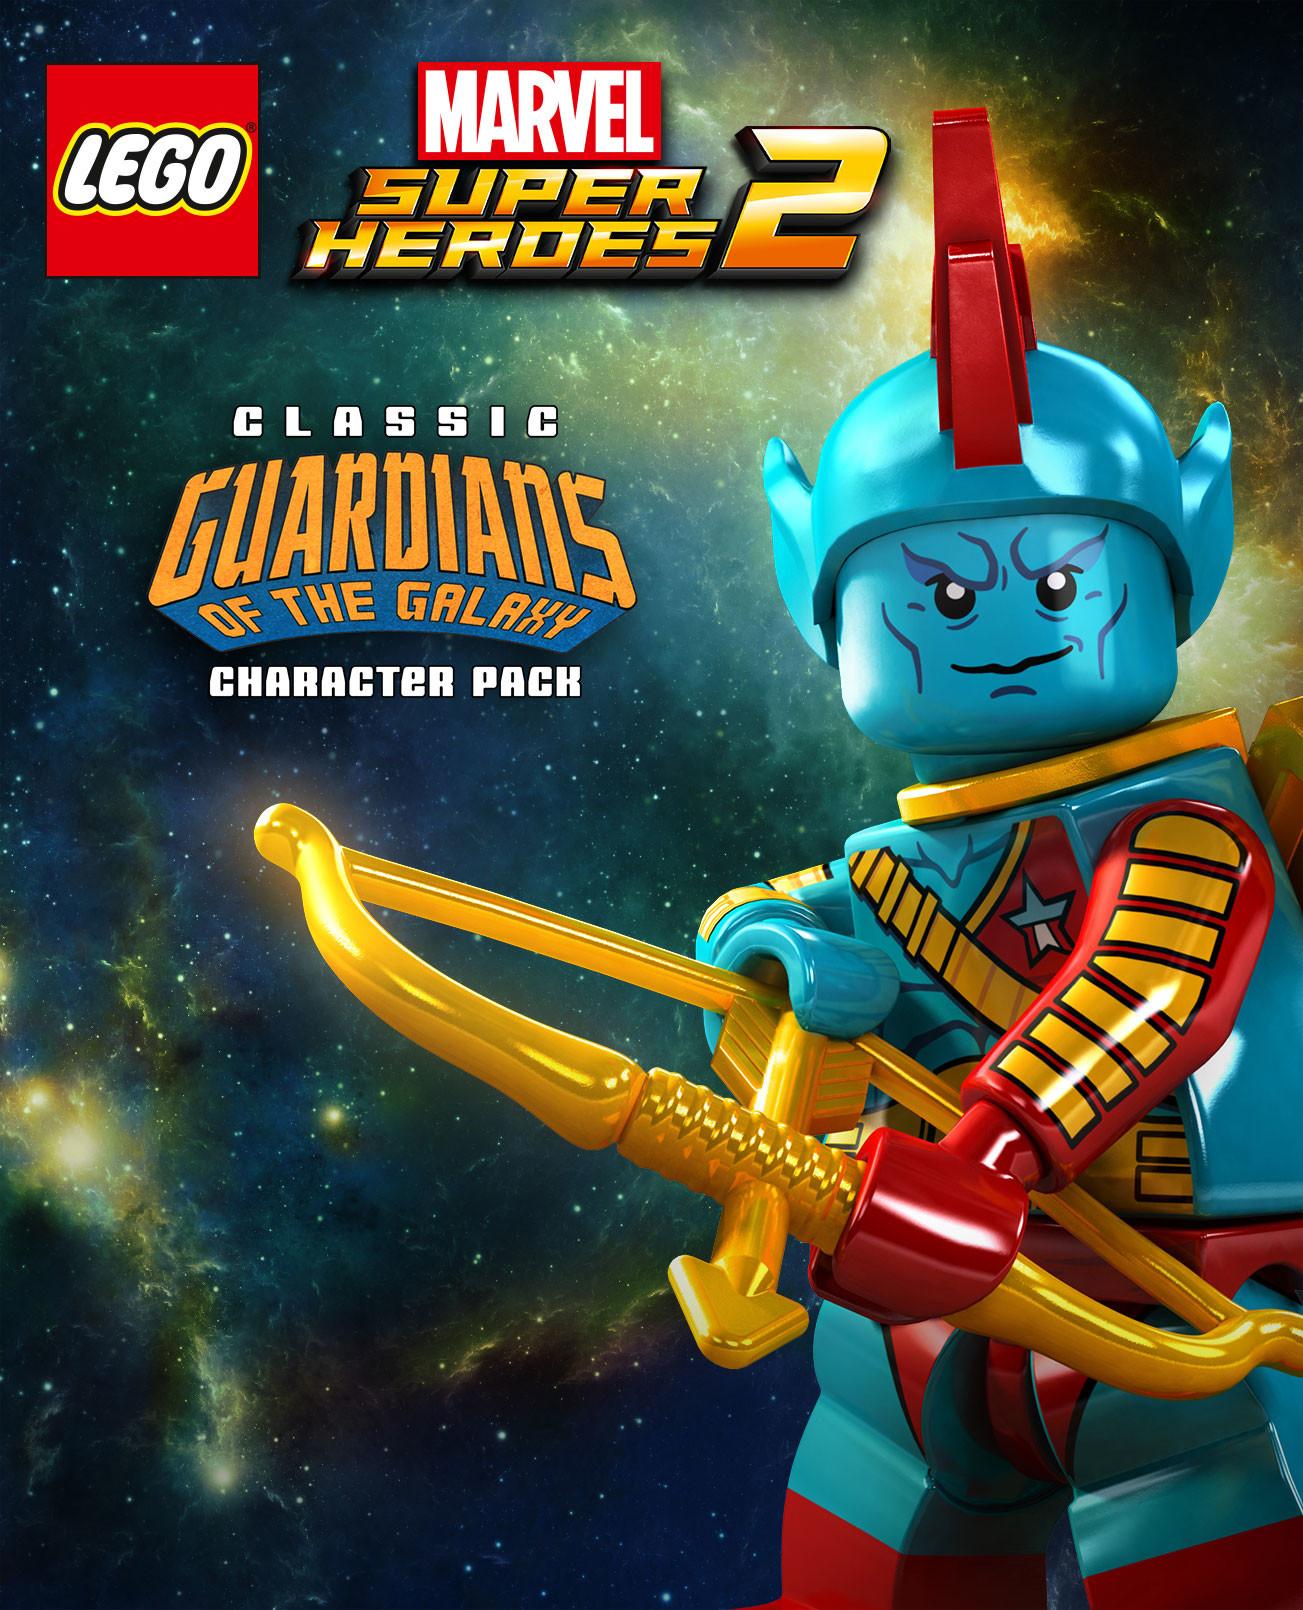 ArtStation - Lego Marvel Superheroes 2, Dulce Isis Segarra López